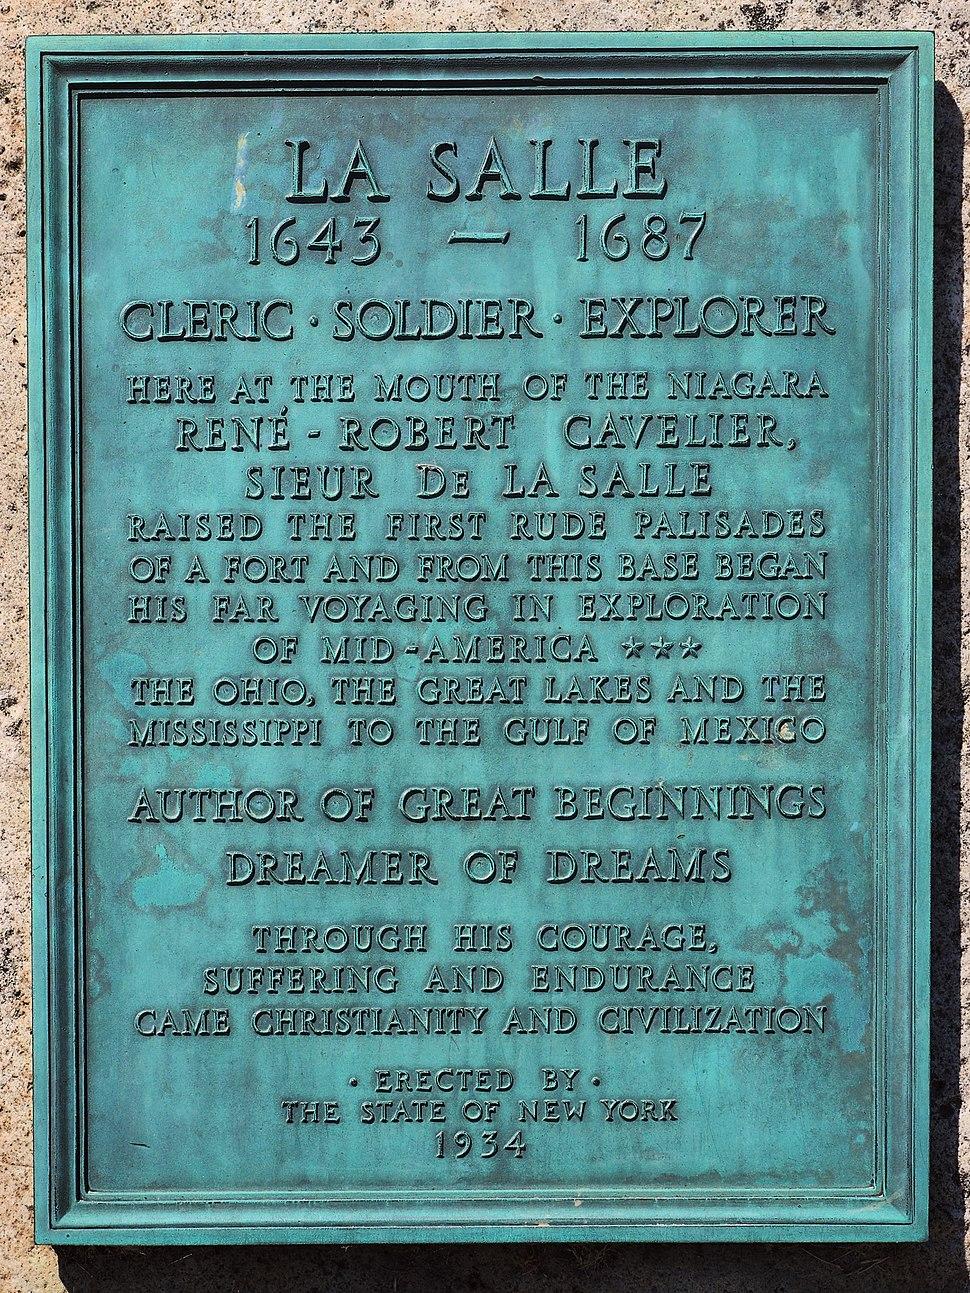 La Salle Plaque NY 1934